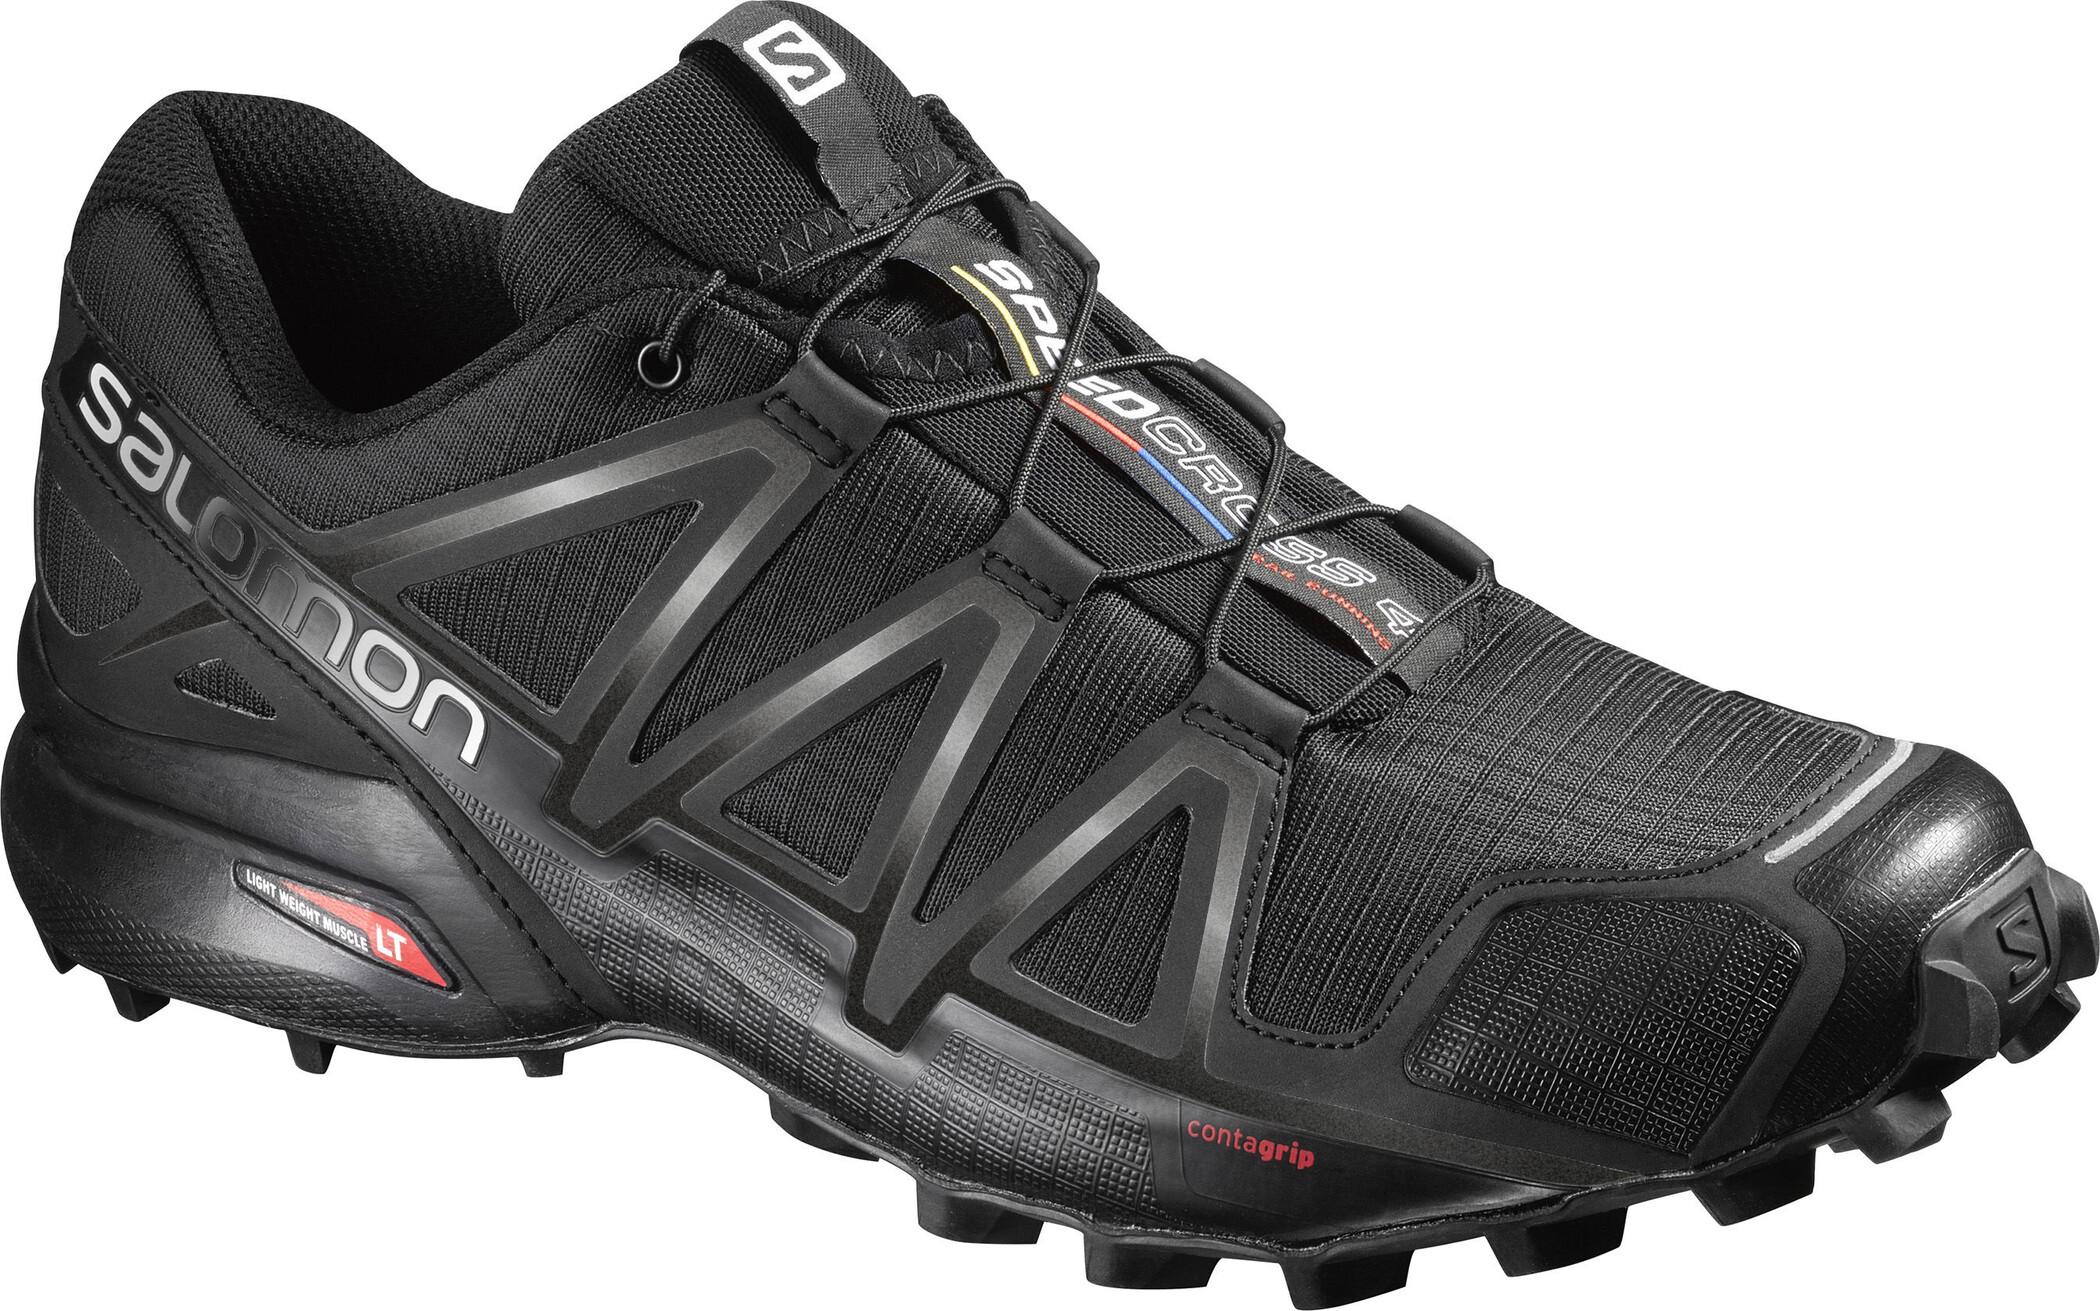 Salomon Speedcross 4 Schuhe Herren blackblackblack metallic